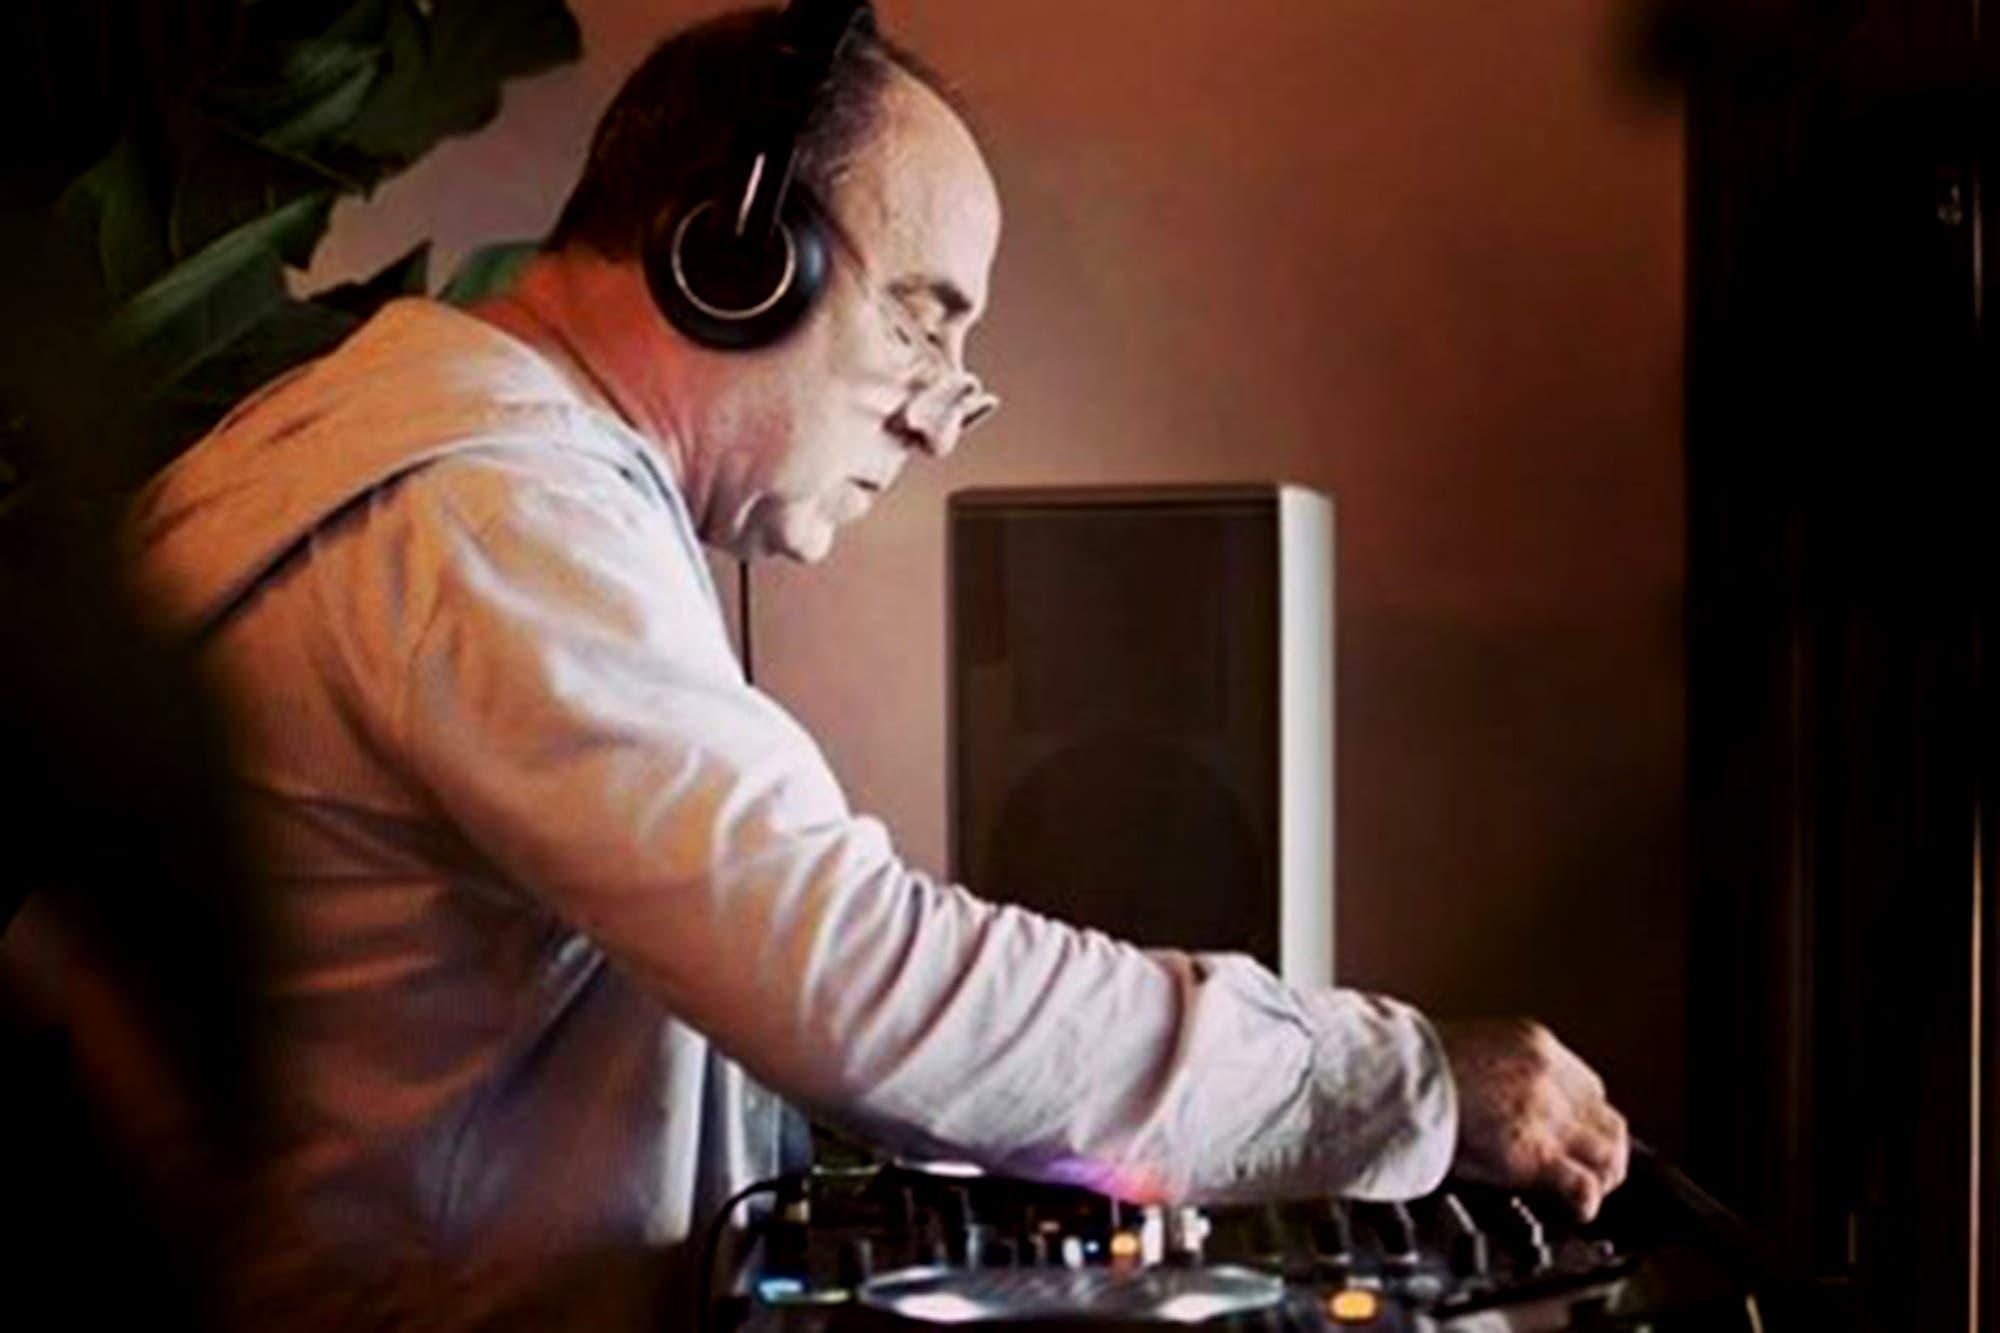 Murió DJ Padilla, el padre del chill out de los atardeceres de Ibiza